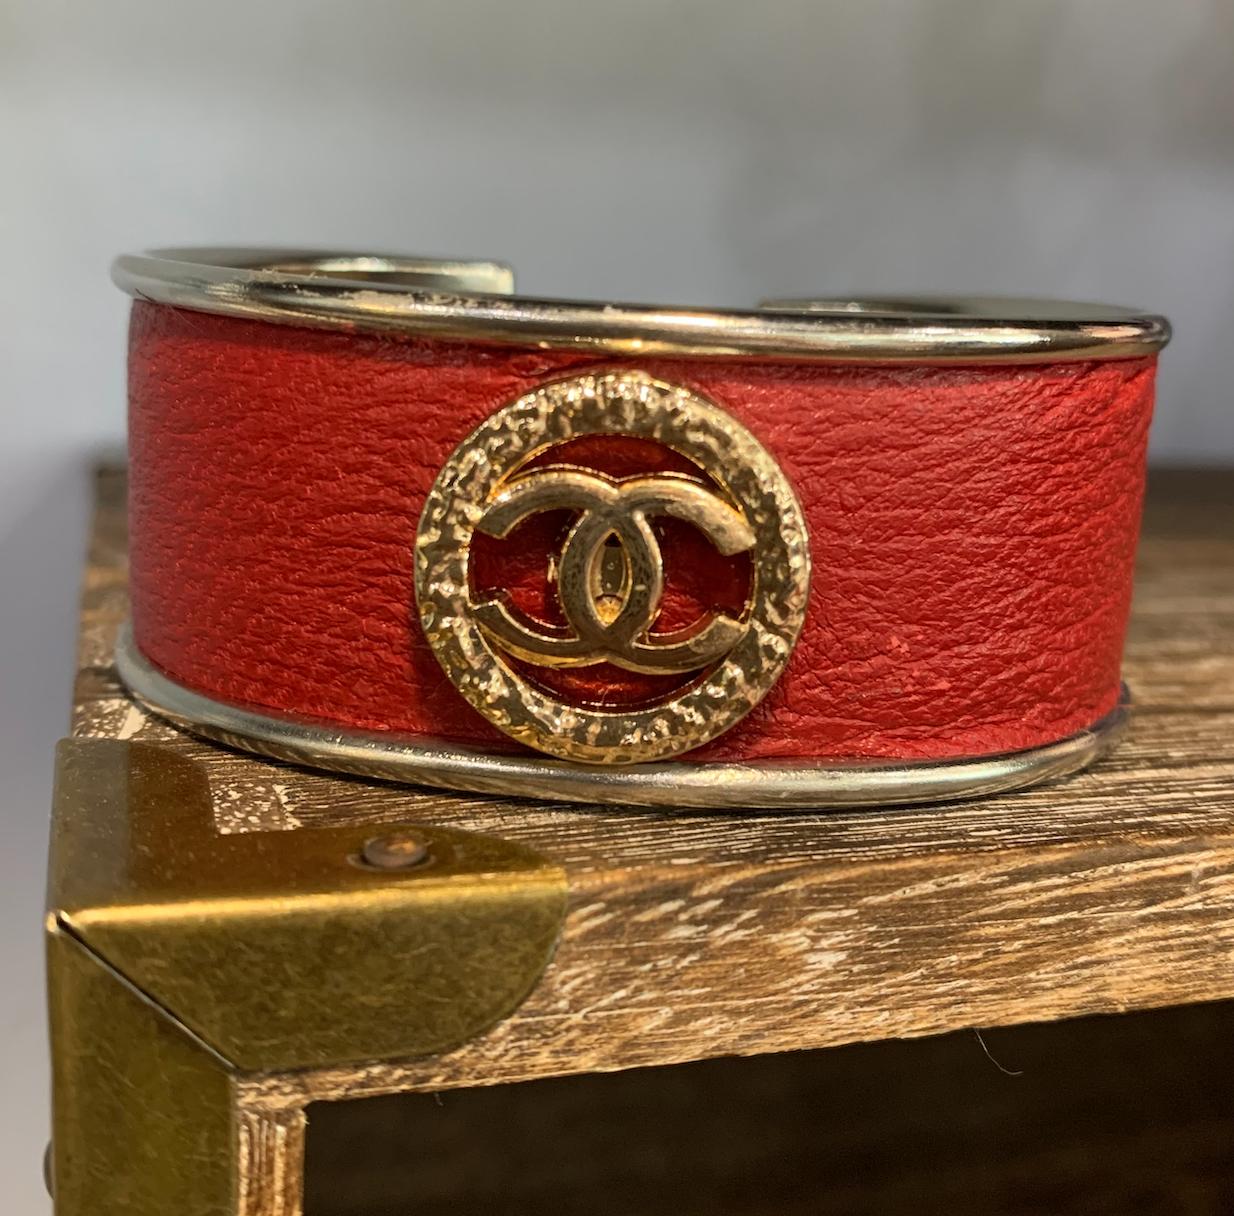 Red/Gold Chanel Petite Cuff